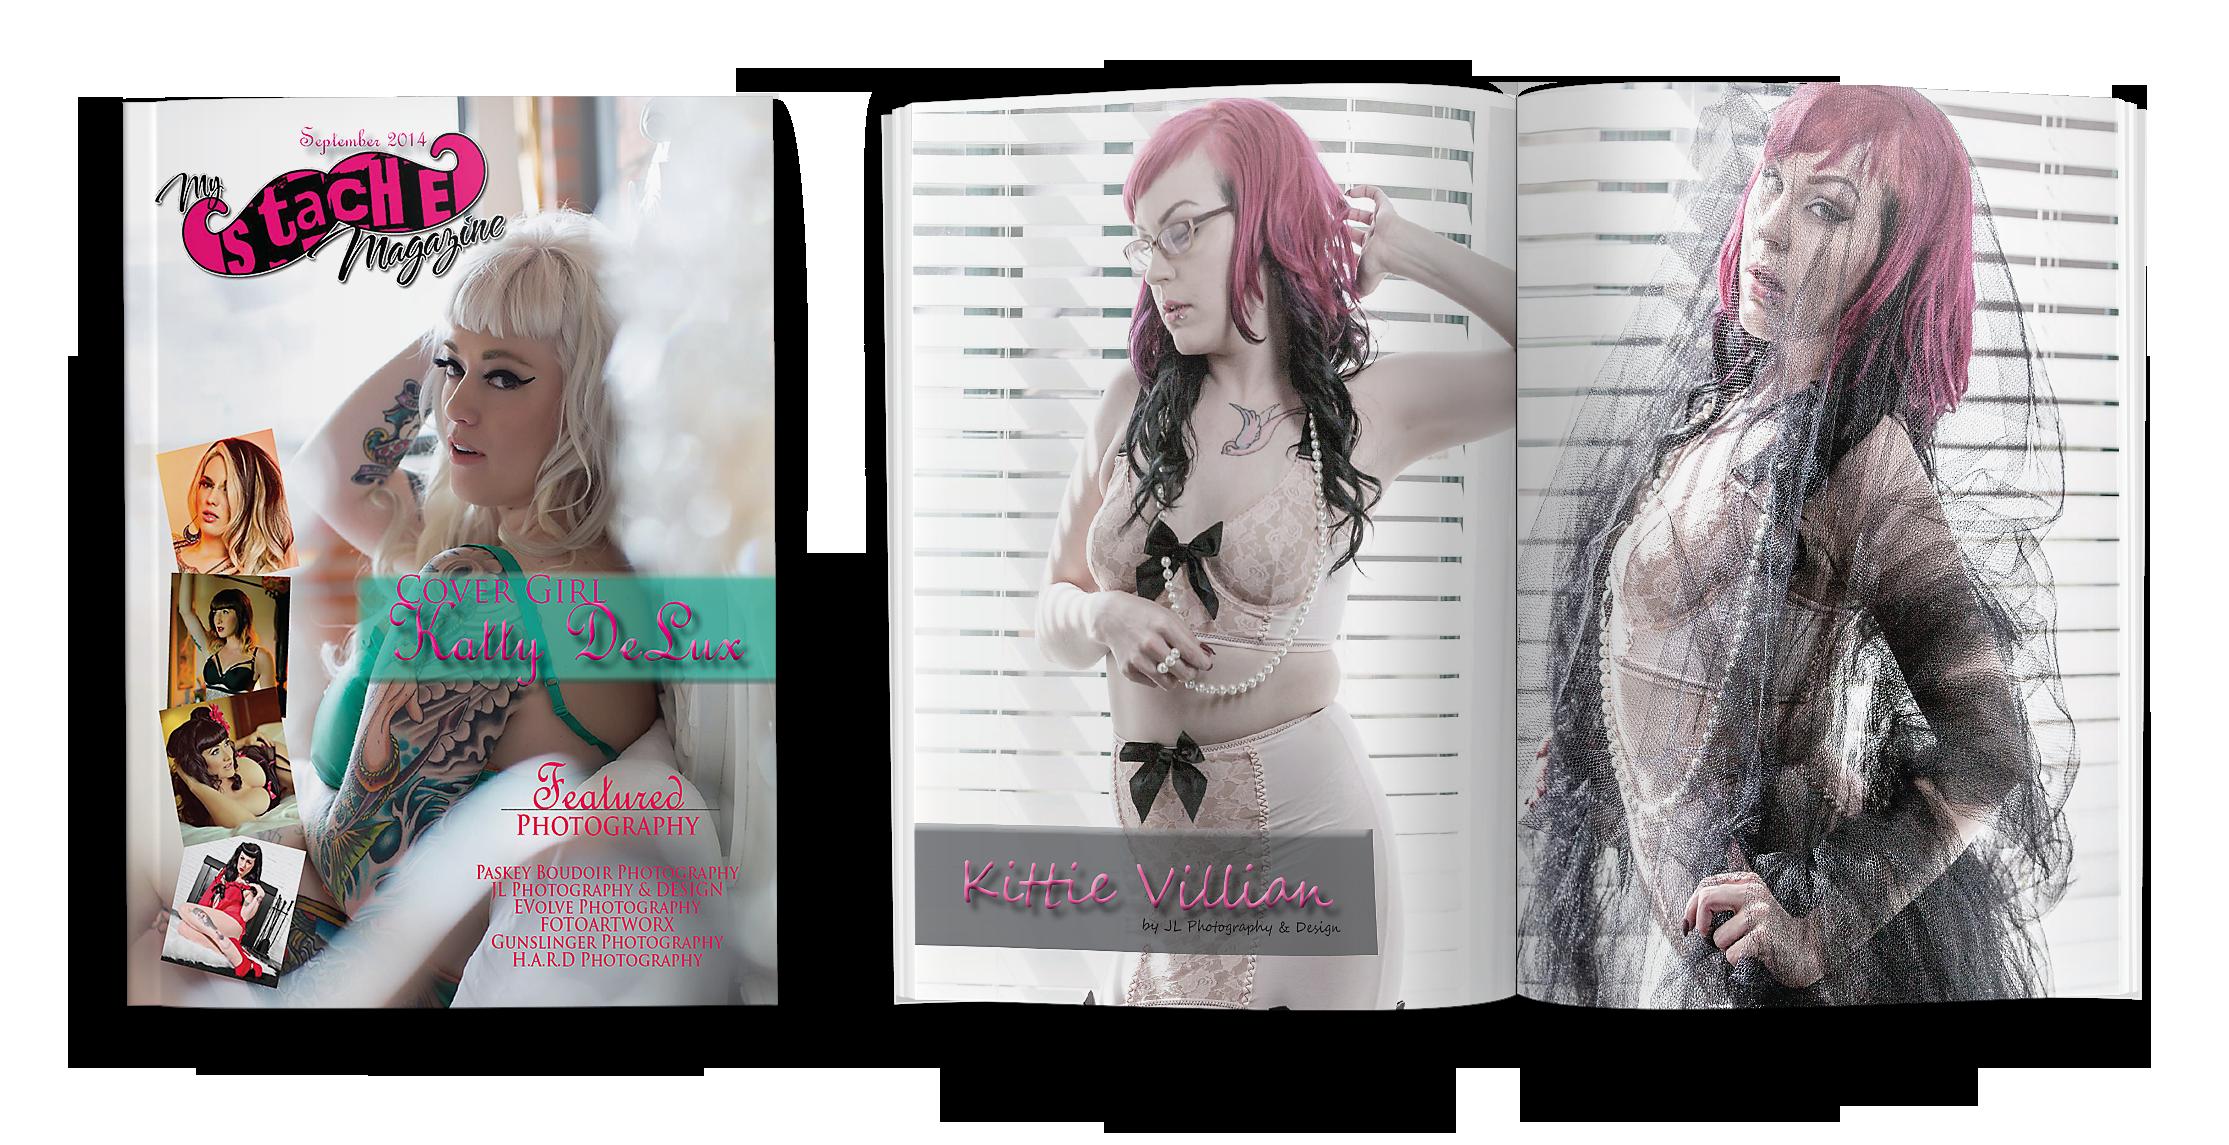 mystache_magazine_sept_2014_vintage_boudoir_render2.png